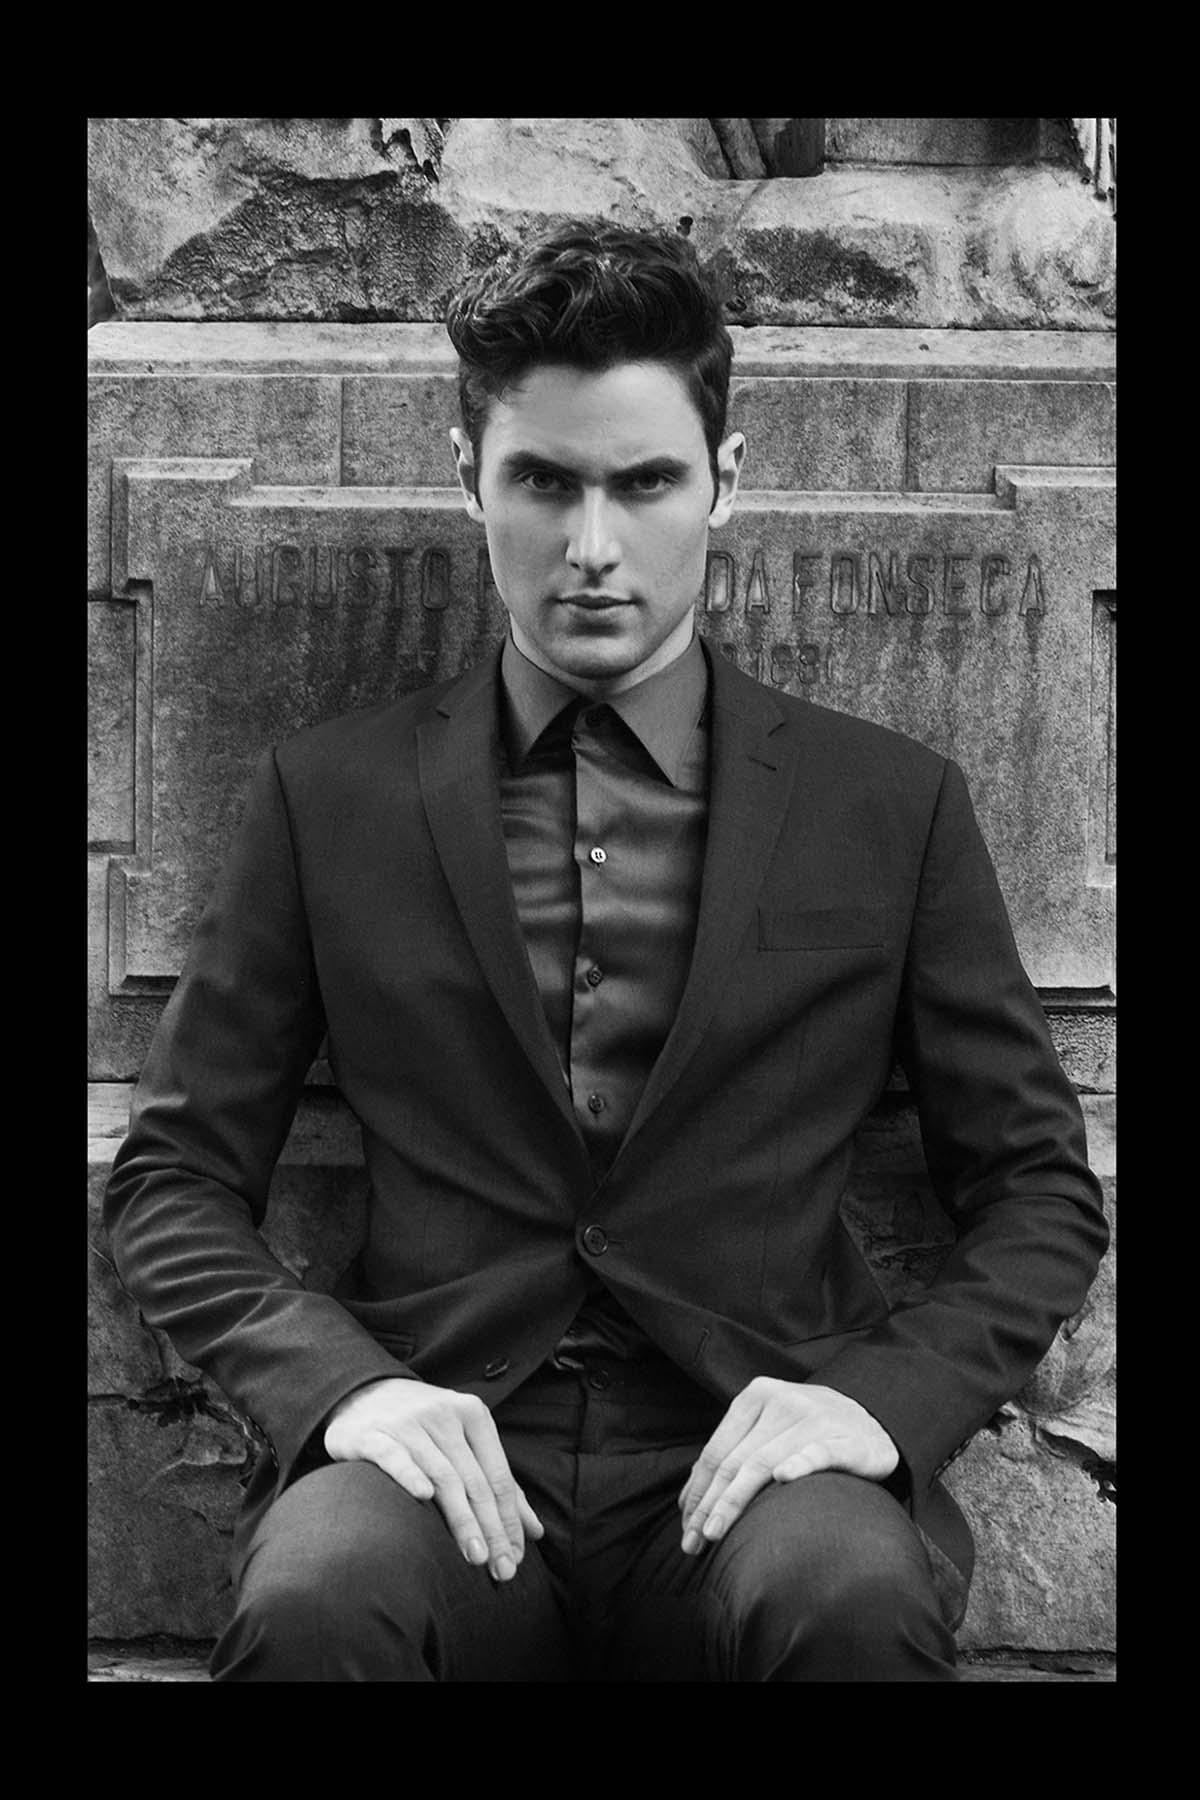 Felipe Carning by Rodrigo Marconatto for Brazilian Male Model